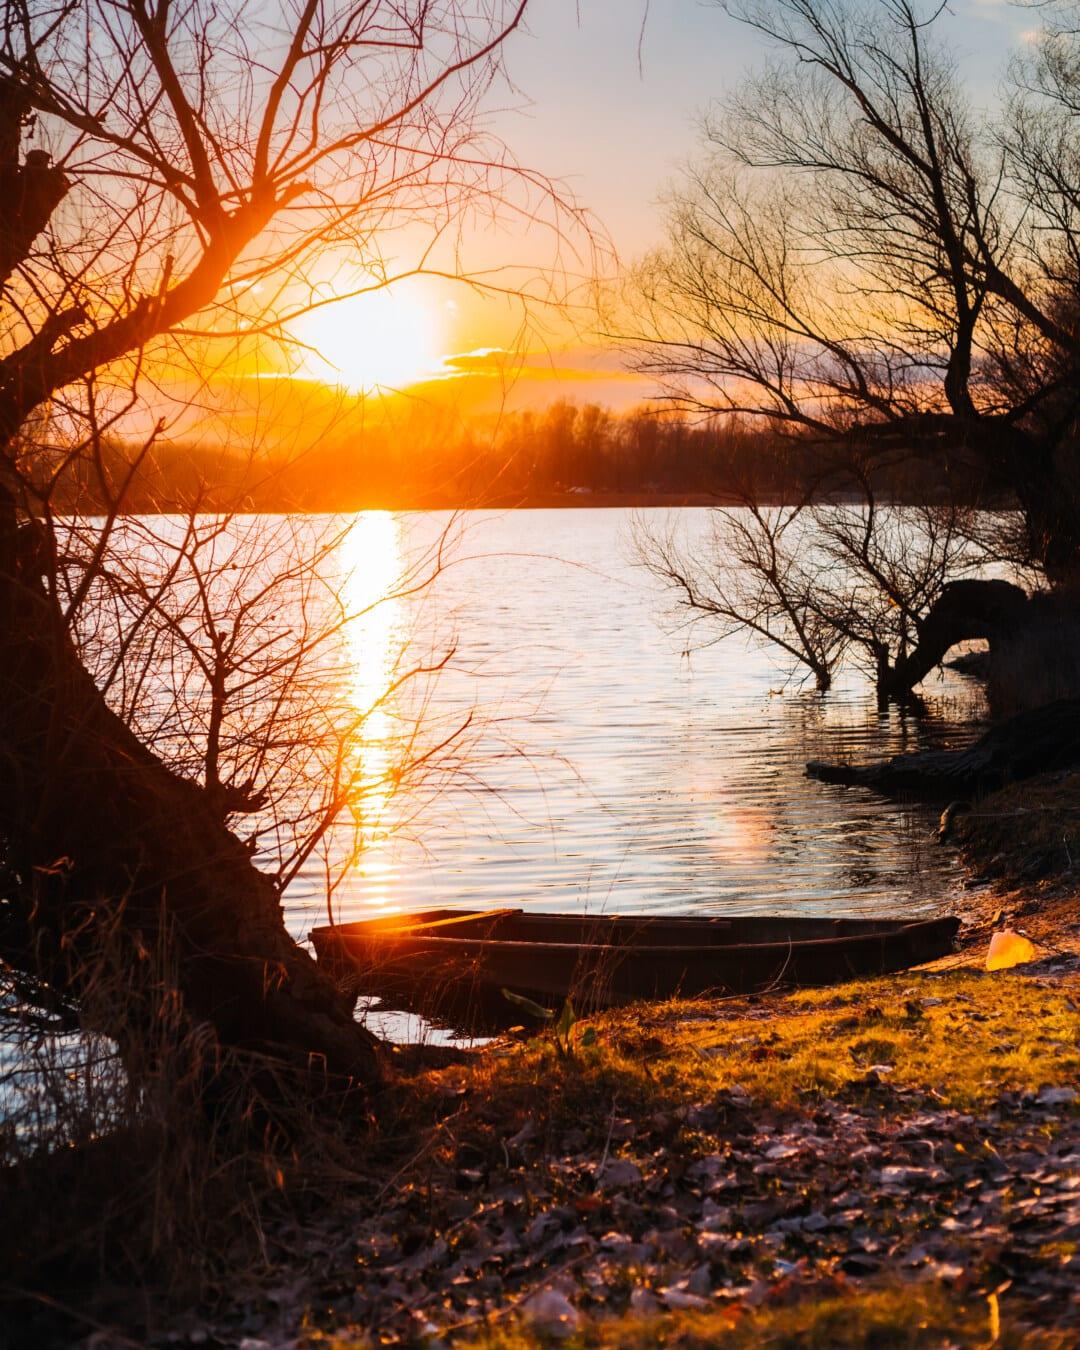 Sonnenaufgang, Flussschiff, Flussufer, Sonne, Orange gelb, bunte, Sonnenlicht, Herbst, Struktur, Sonnenuntergang